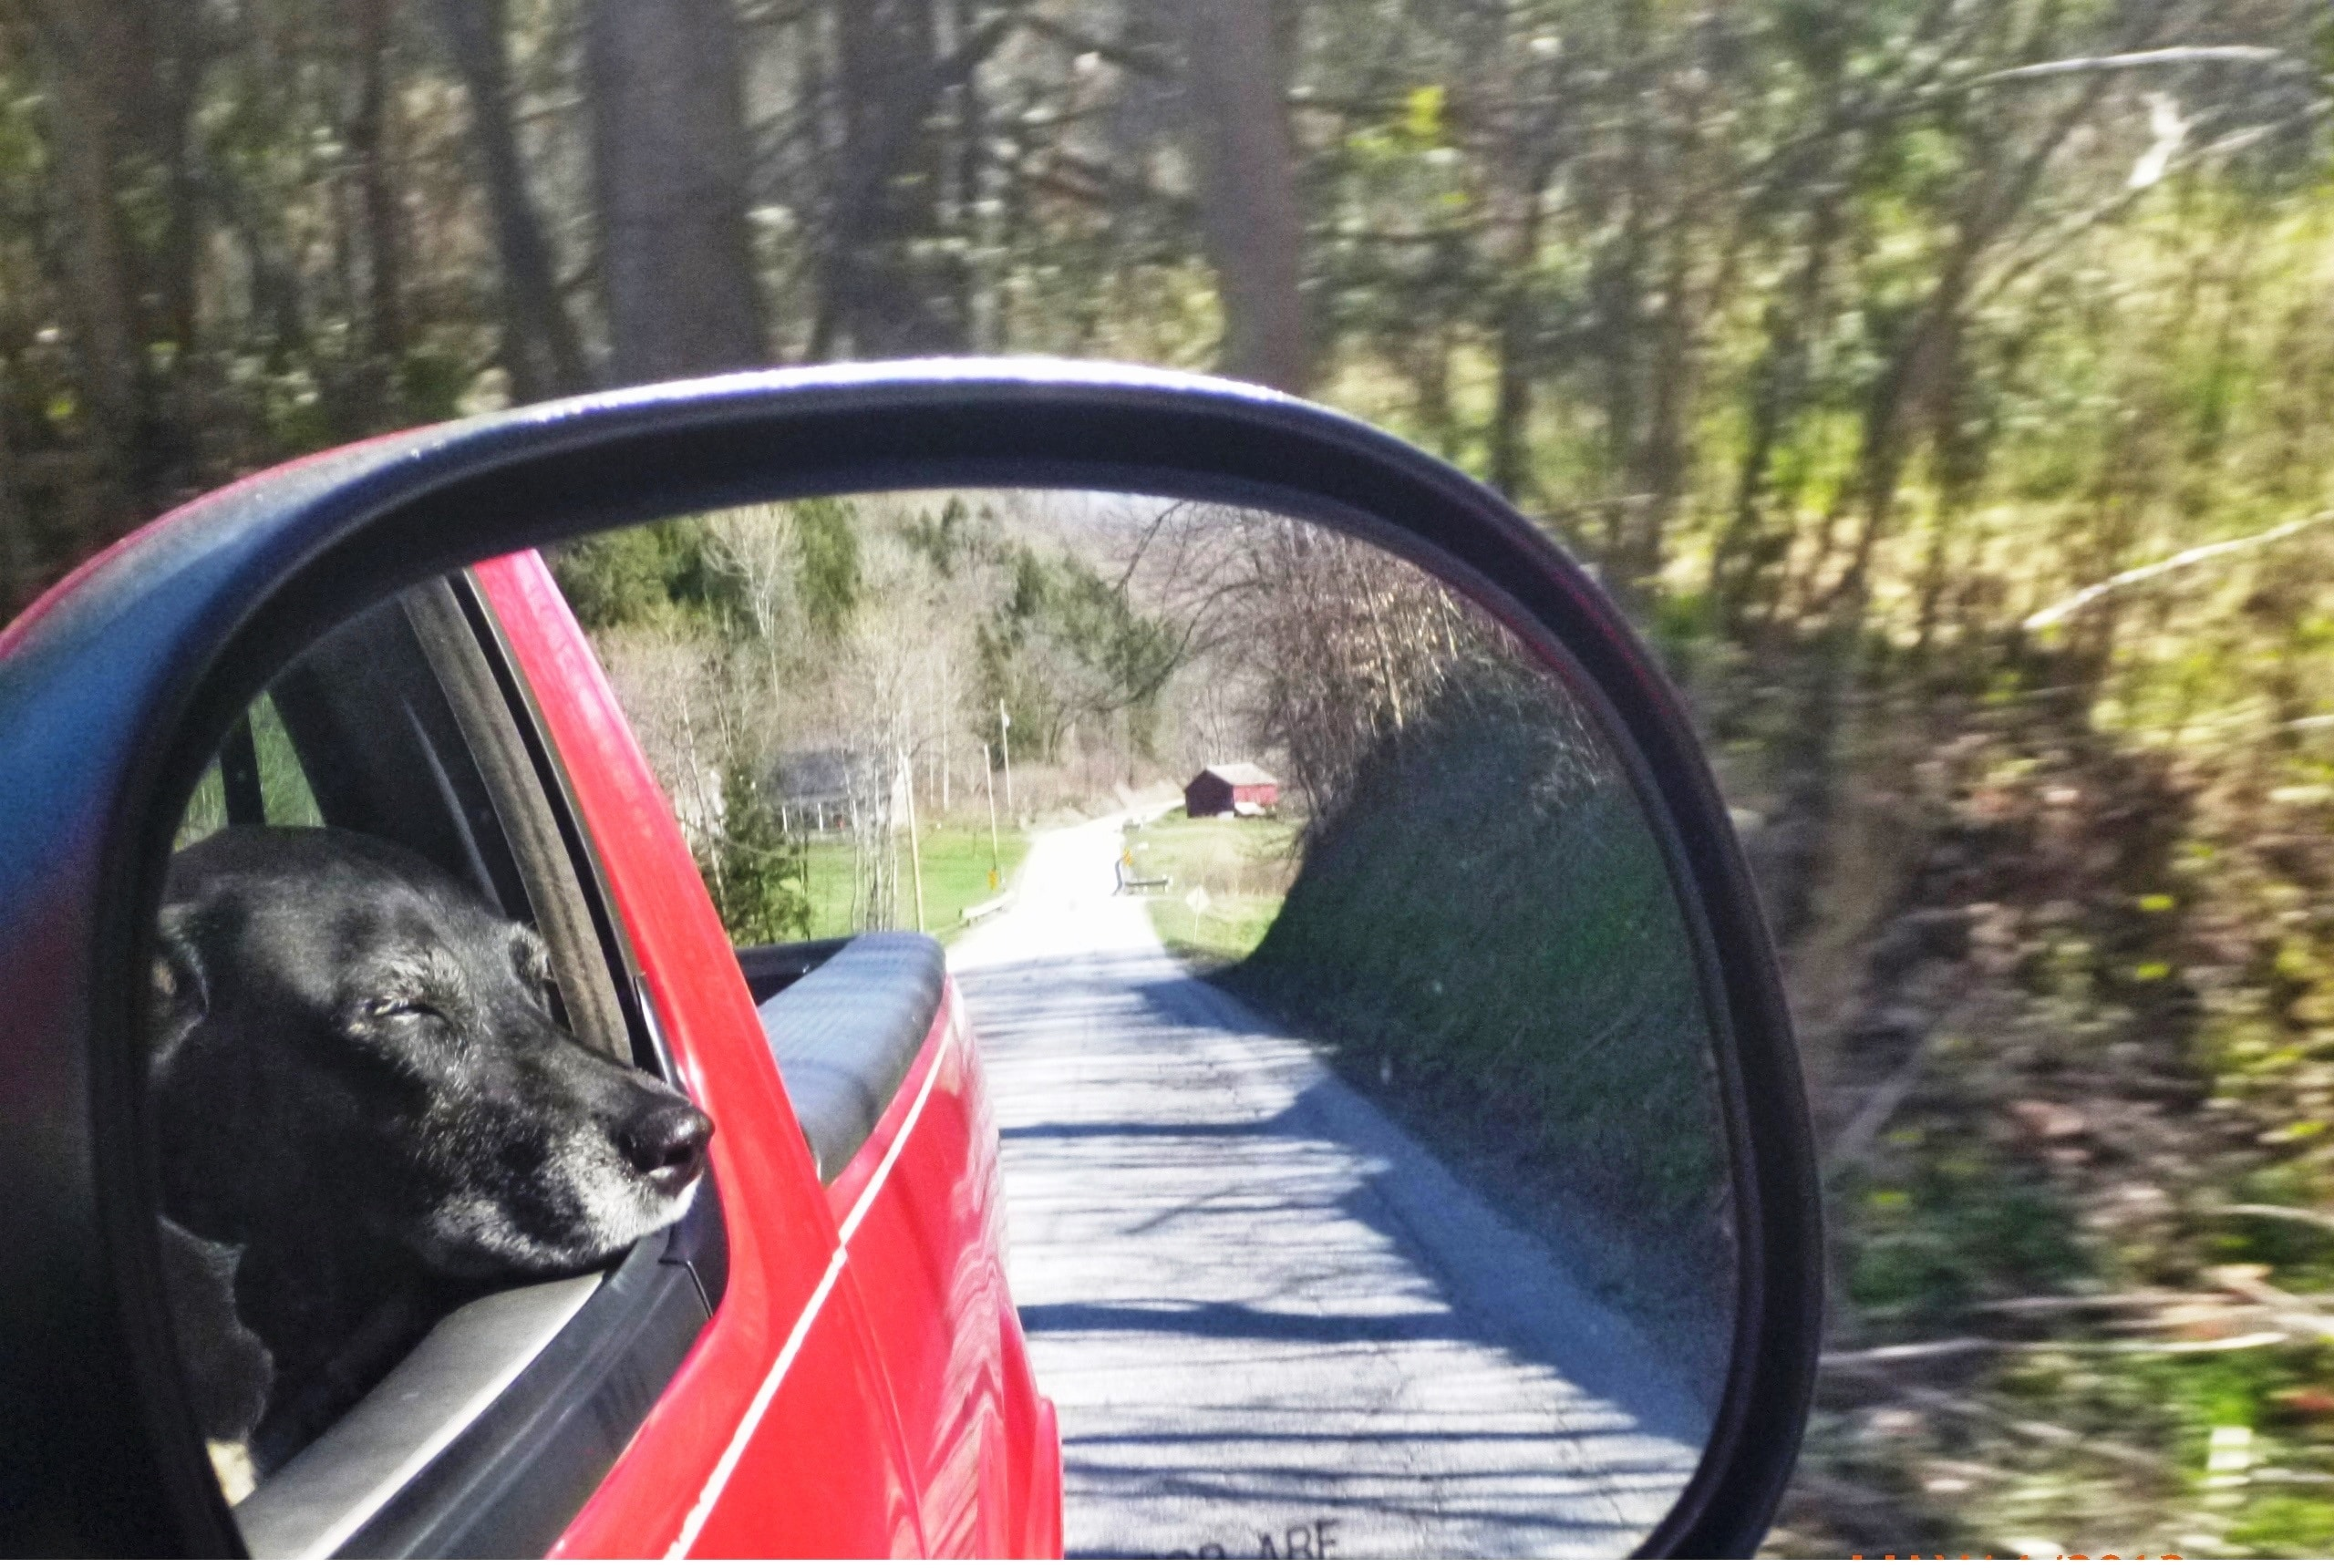 black lab dog in car in rear view mirror